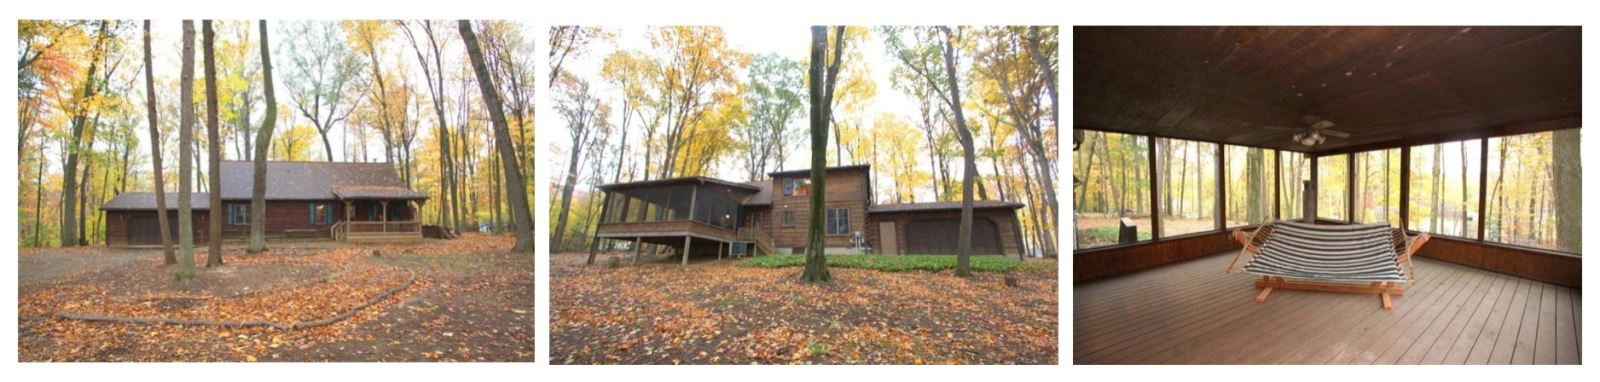 Apple Valley Lake Log Cabin Home For Sale by Sam Miller